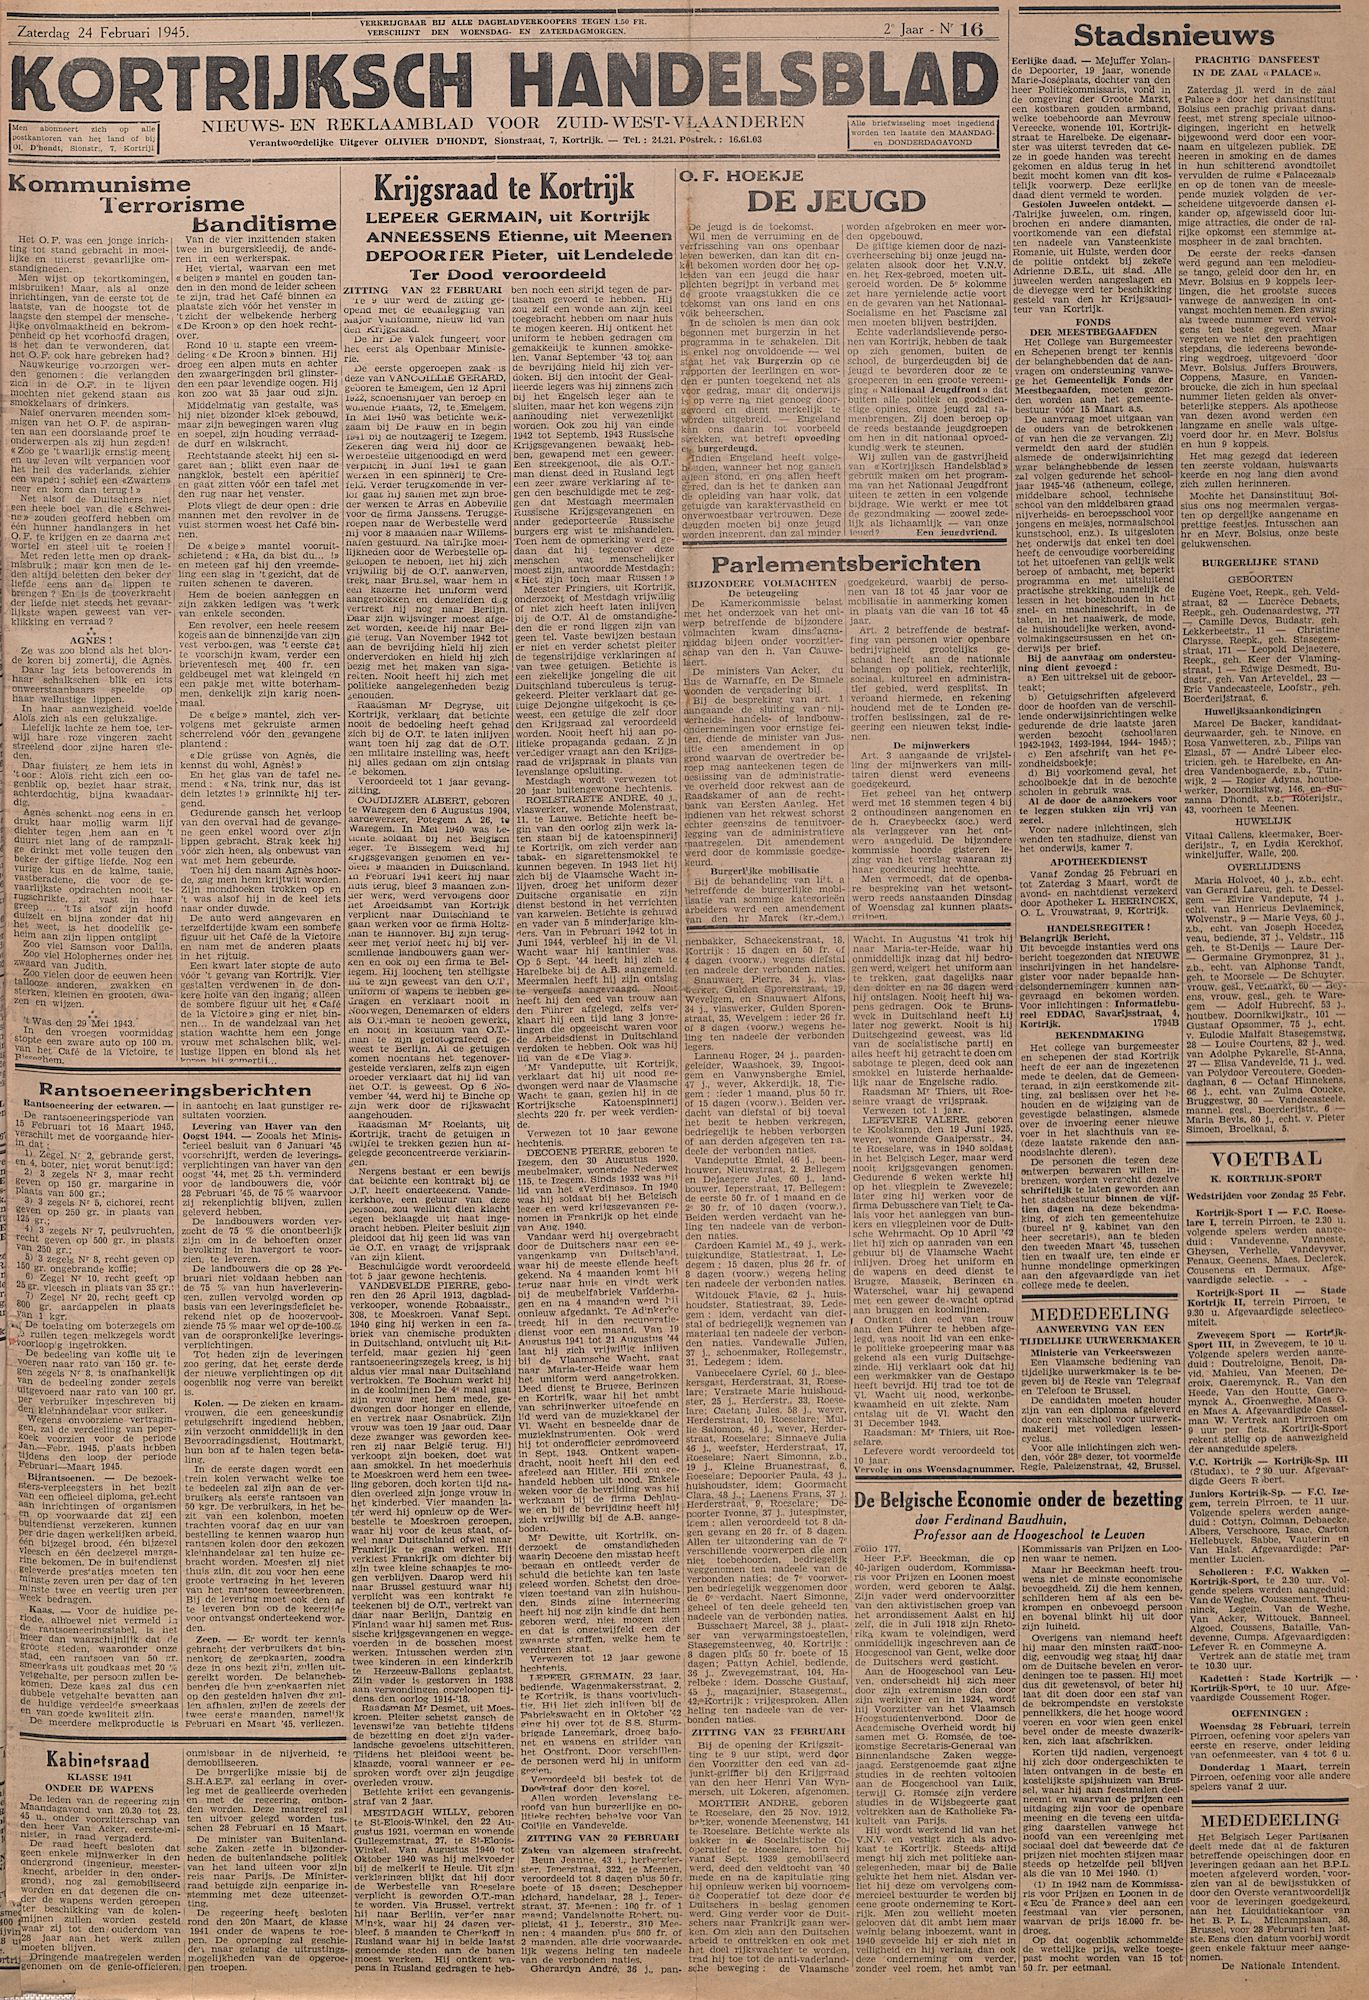 Kortrijks Handelsblad 24 februari 1945 Nr16 p1